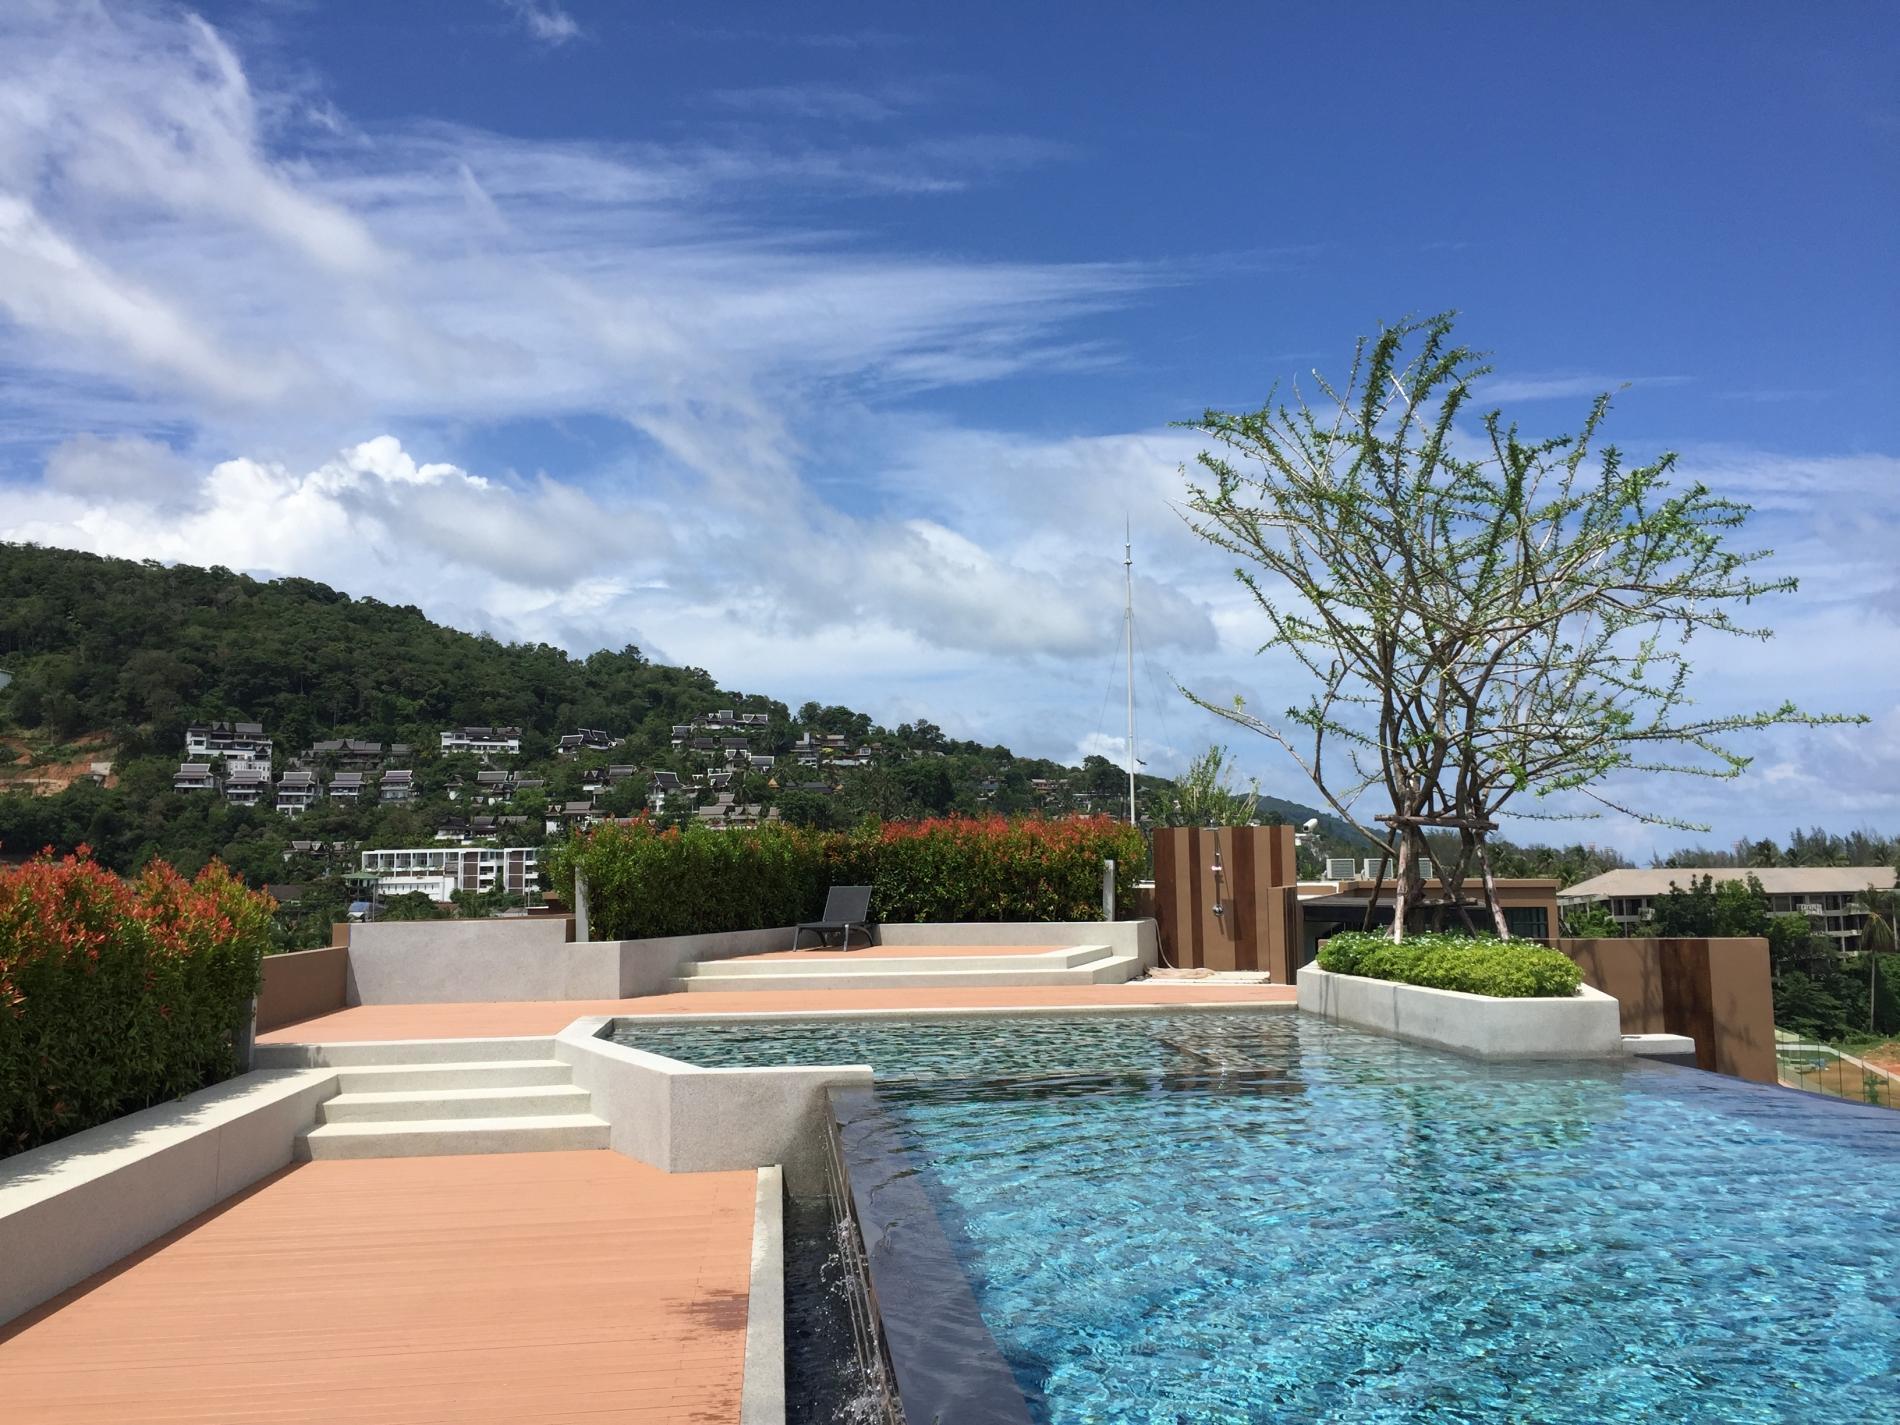 Apartment 6Av 707 - Convenient Surin beach condo with pool and gym photo 18670361